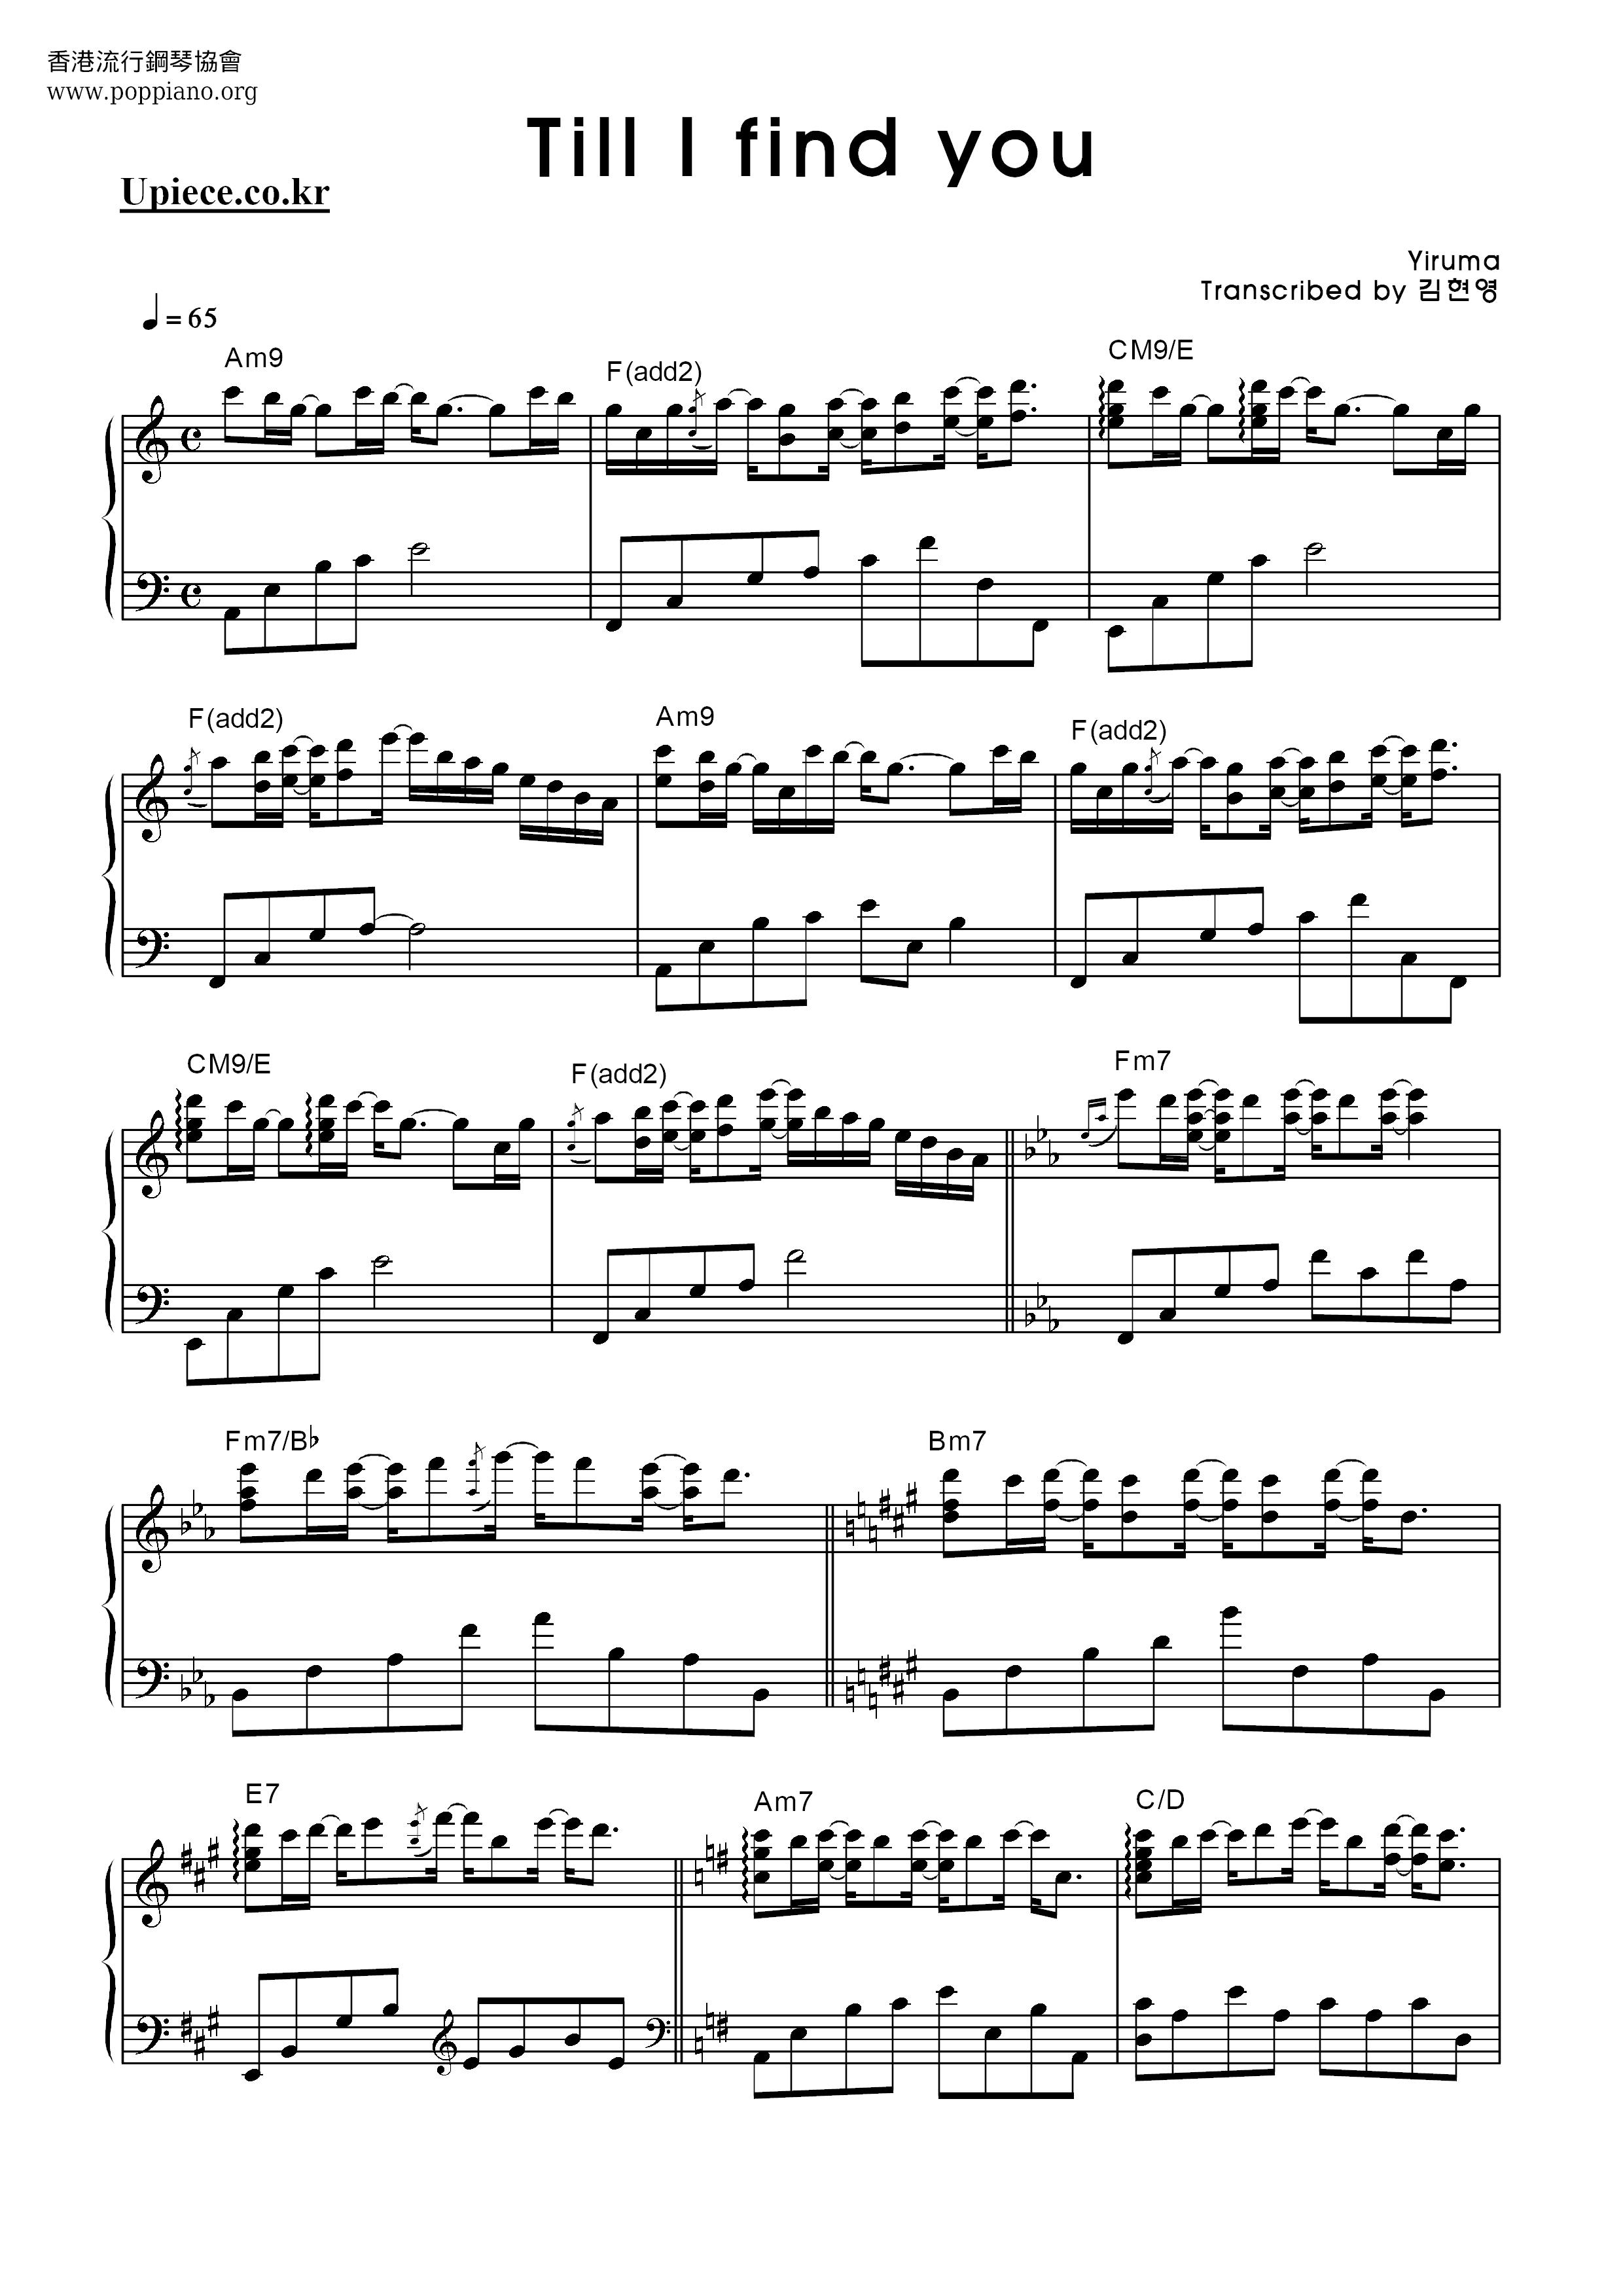 ☆ yiruma-till i find you sheet music pdf, - free score download ☆  www.poppiano.org